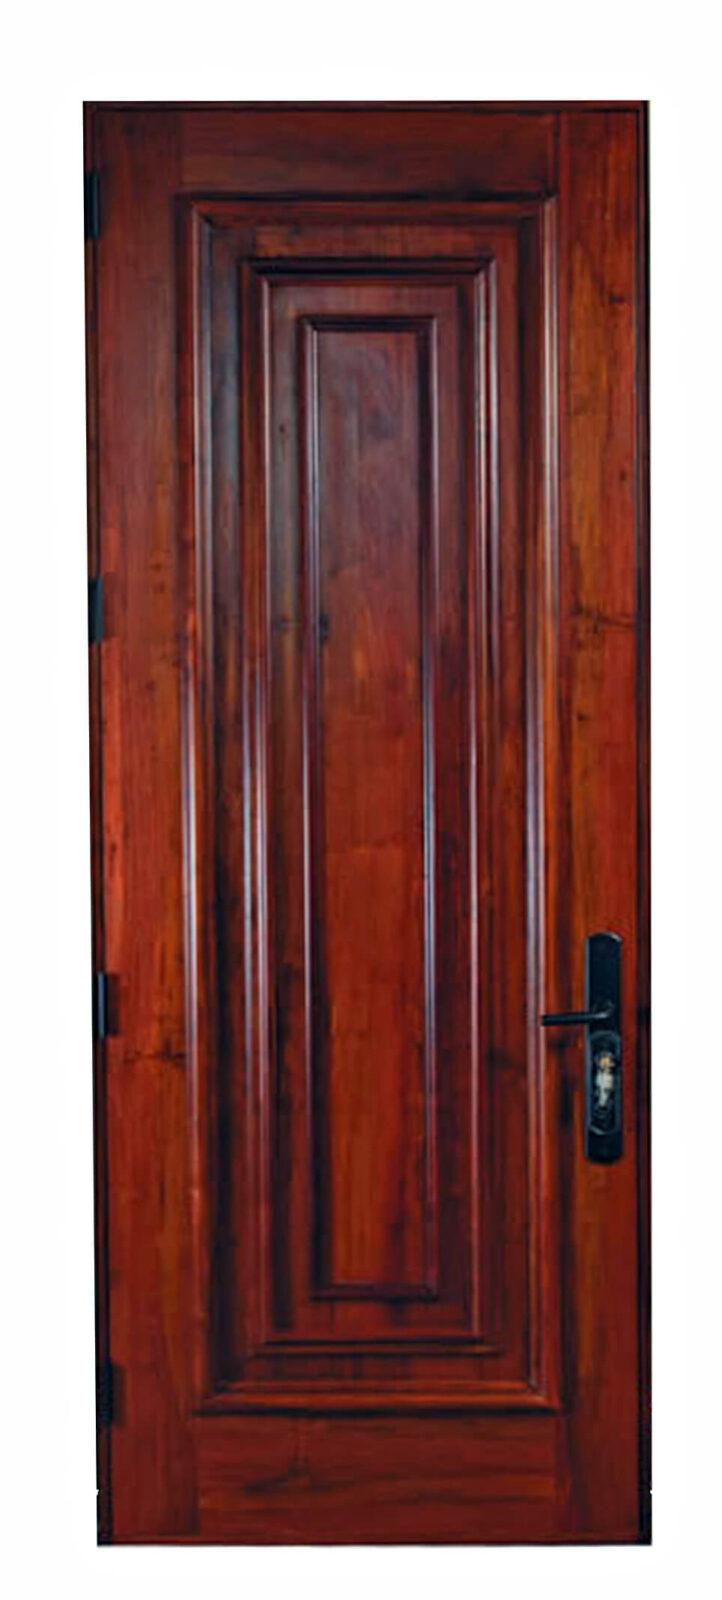 PRINCE MAHOGANY DOOR.